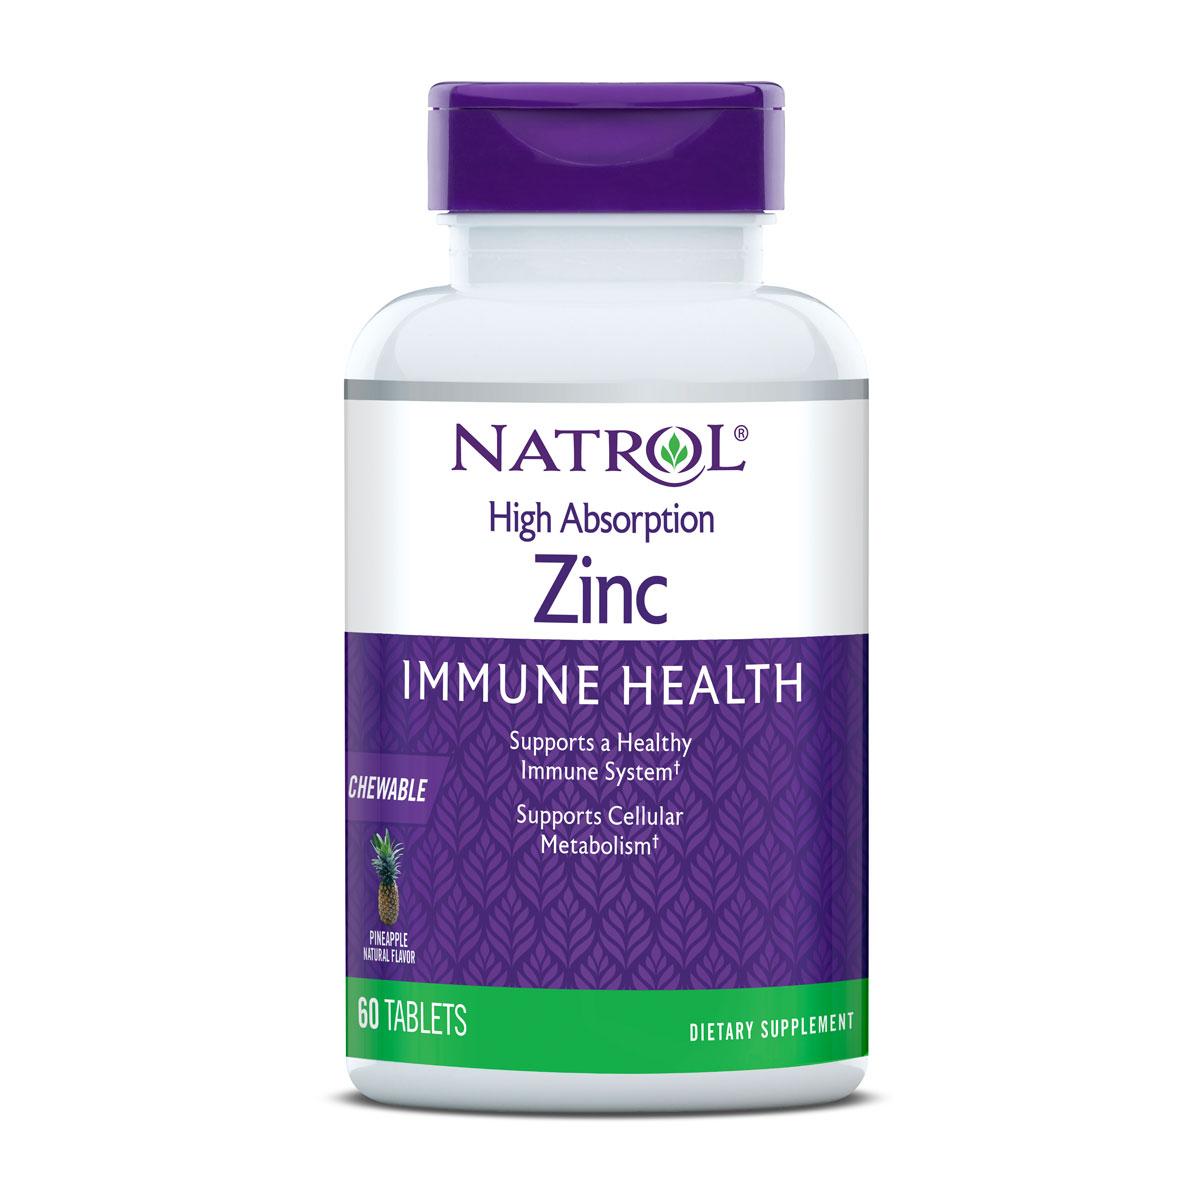 Natrol Zinc High Absorption